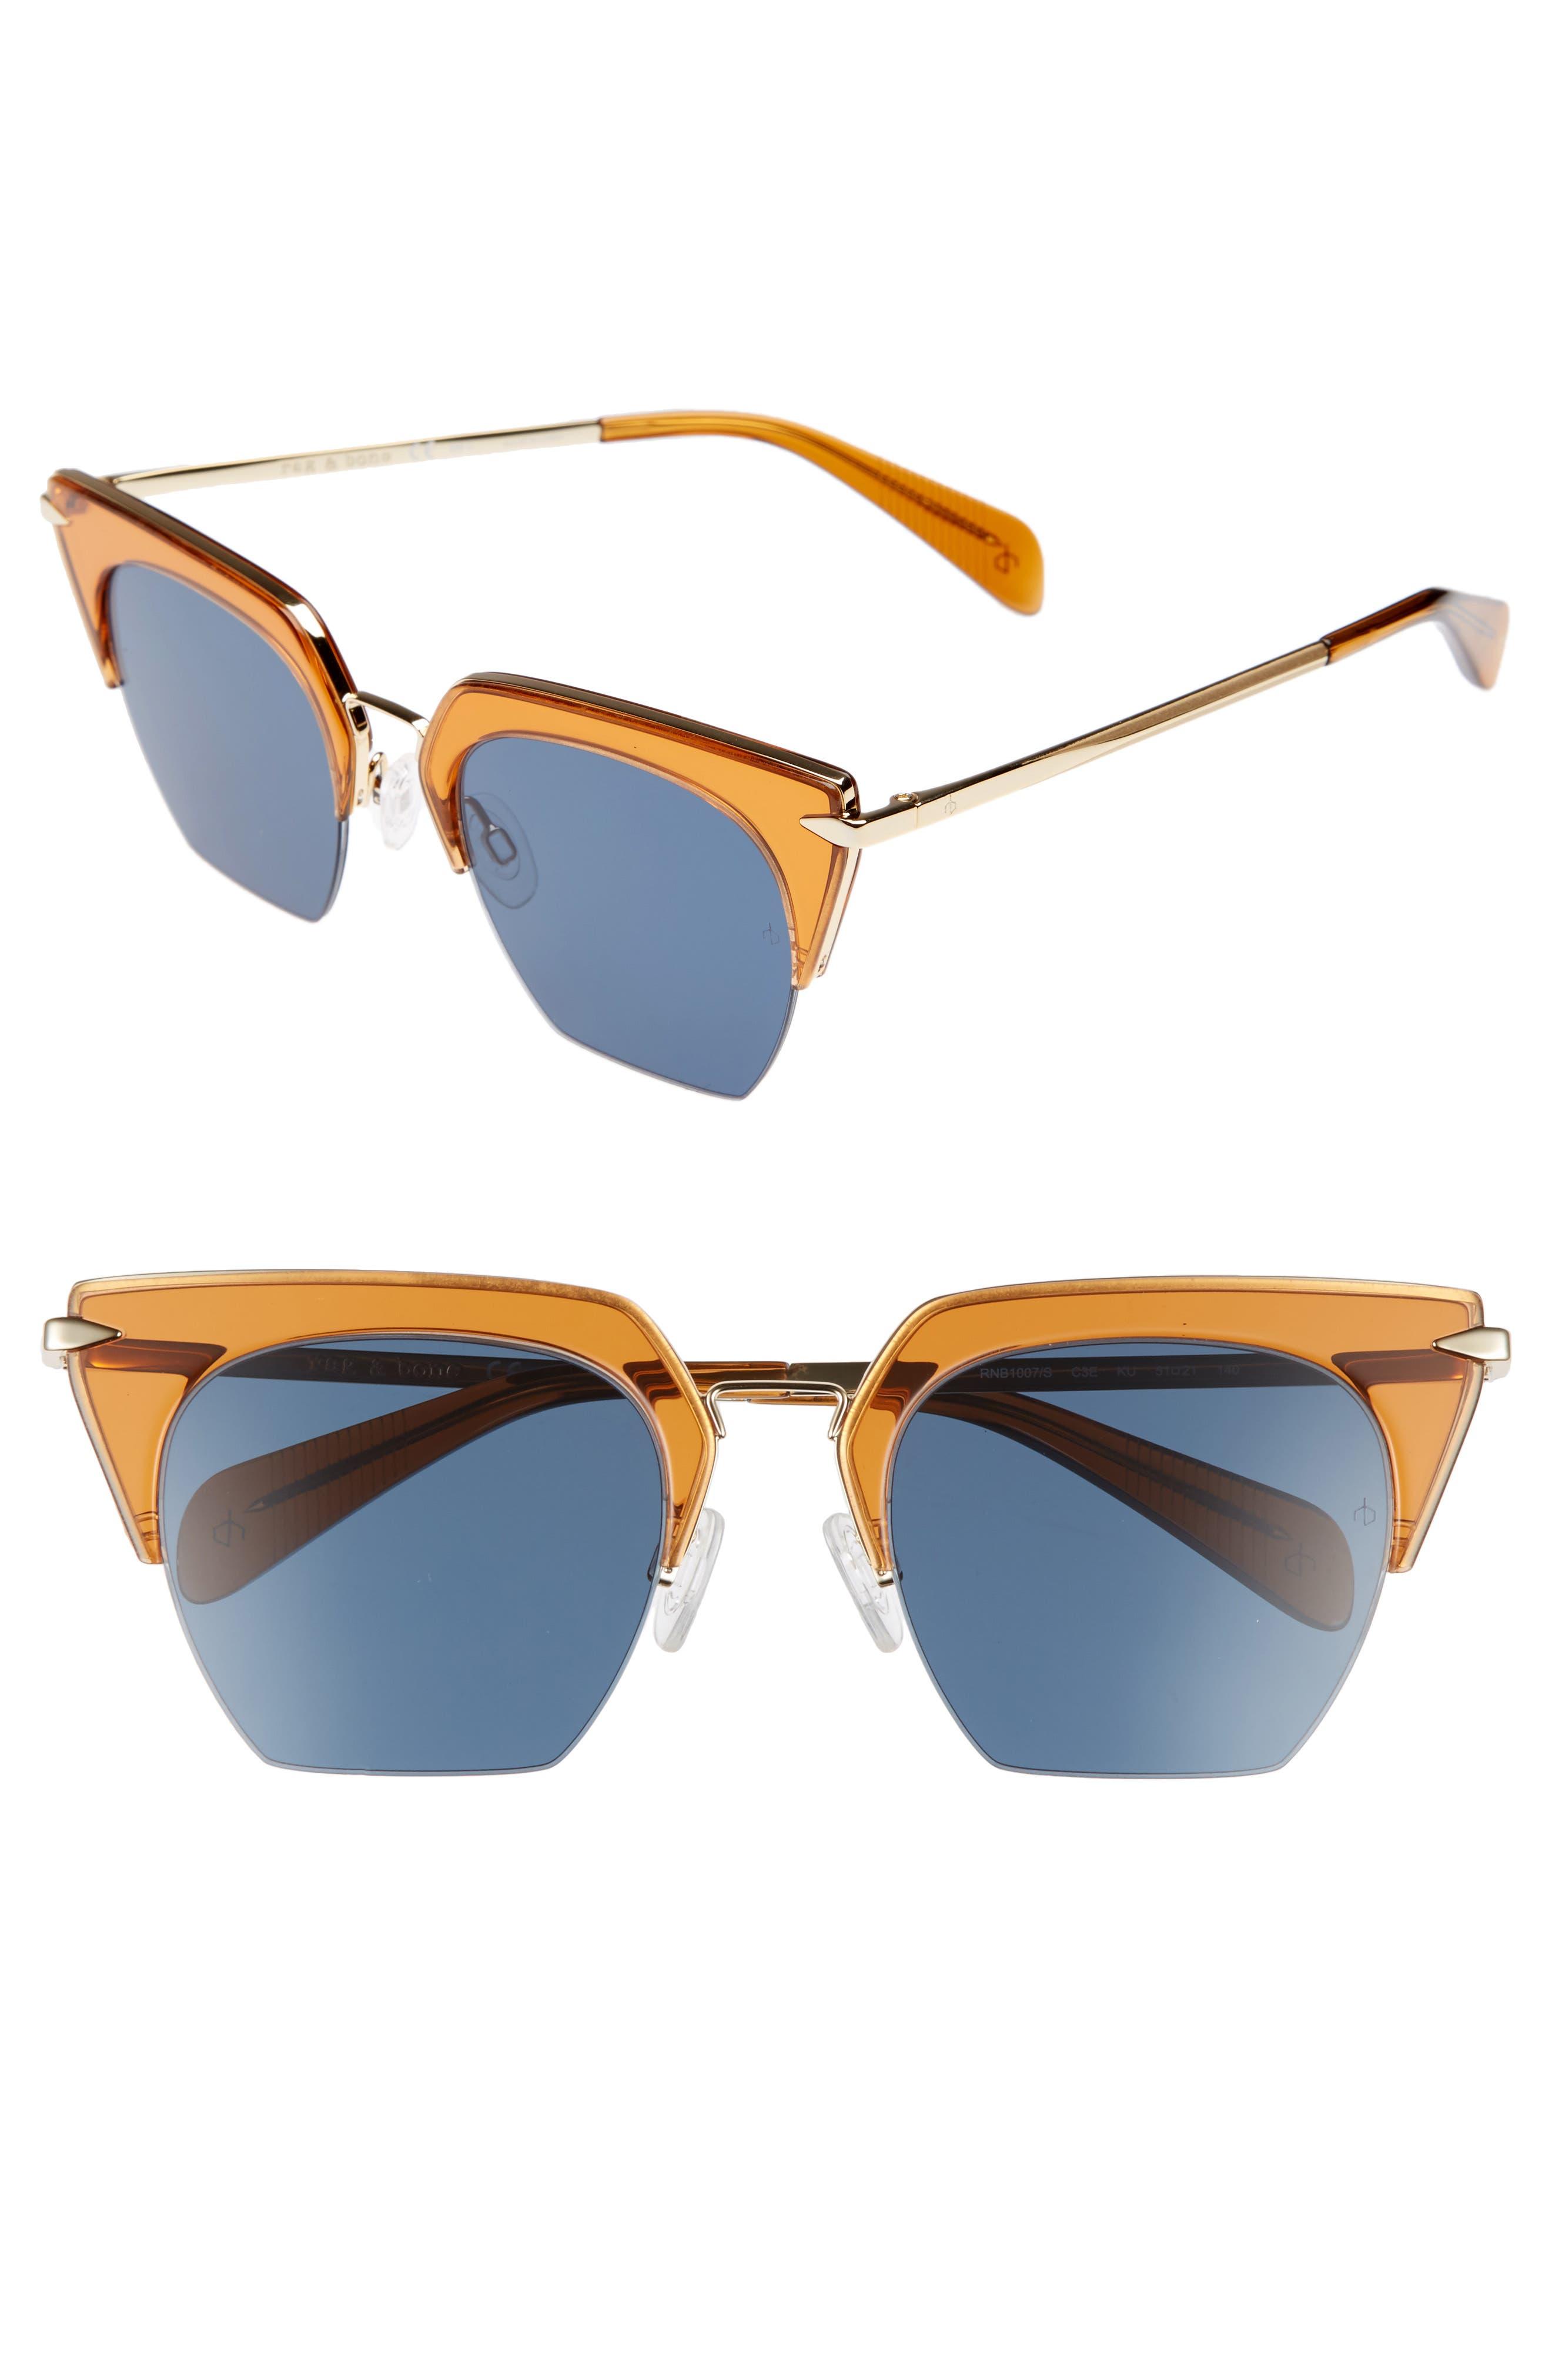 51mm Cat Eye Sunglasses,                         Main,                         color, Orange/ Gold